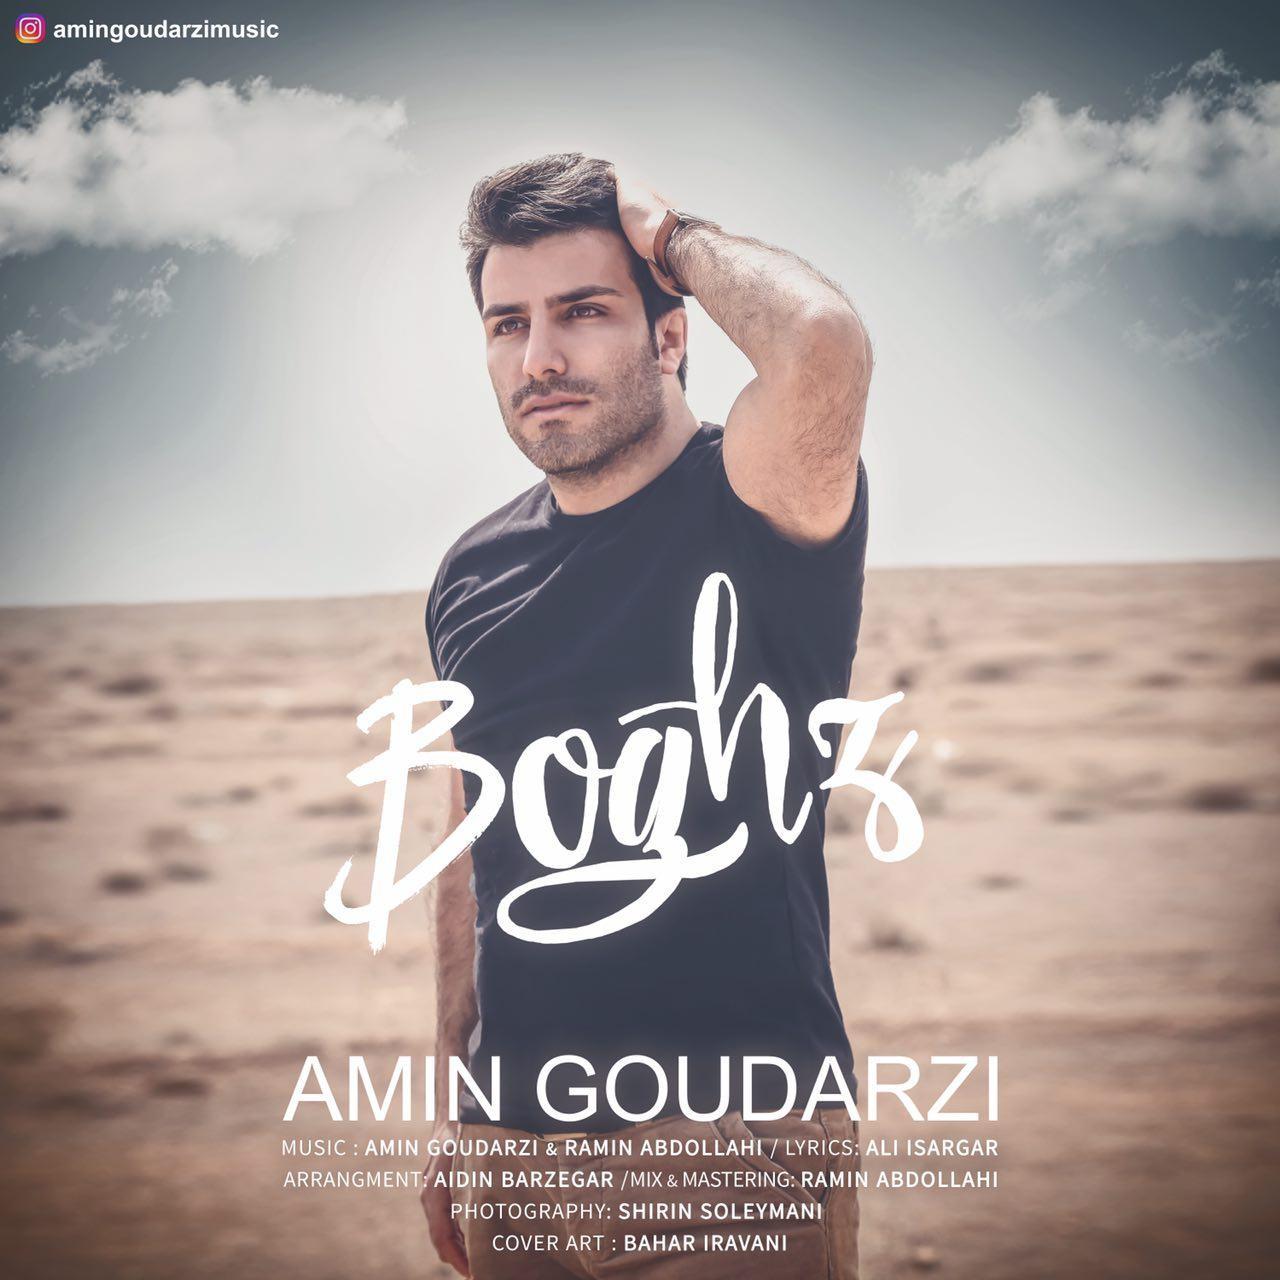 Amin Goudarzi – Boghz